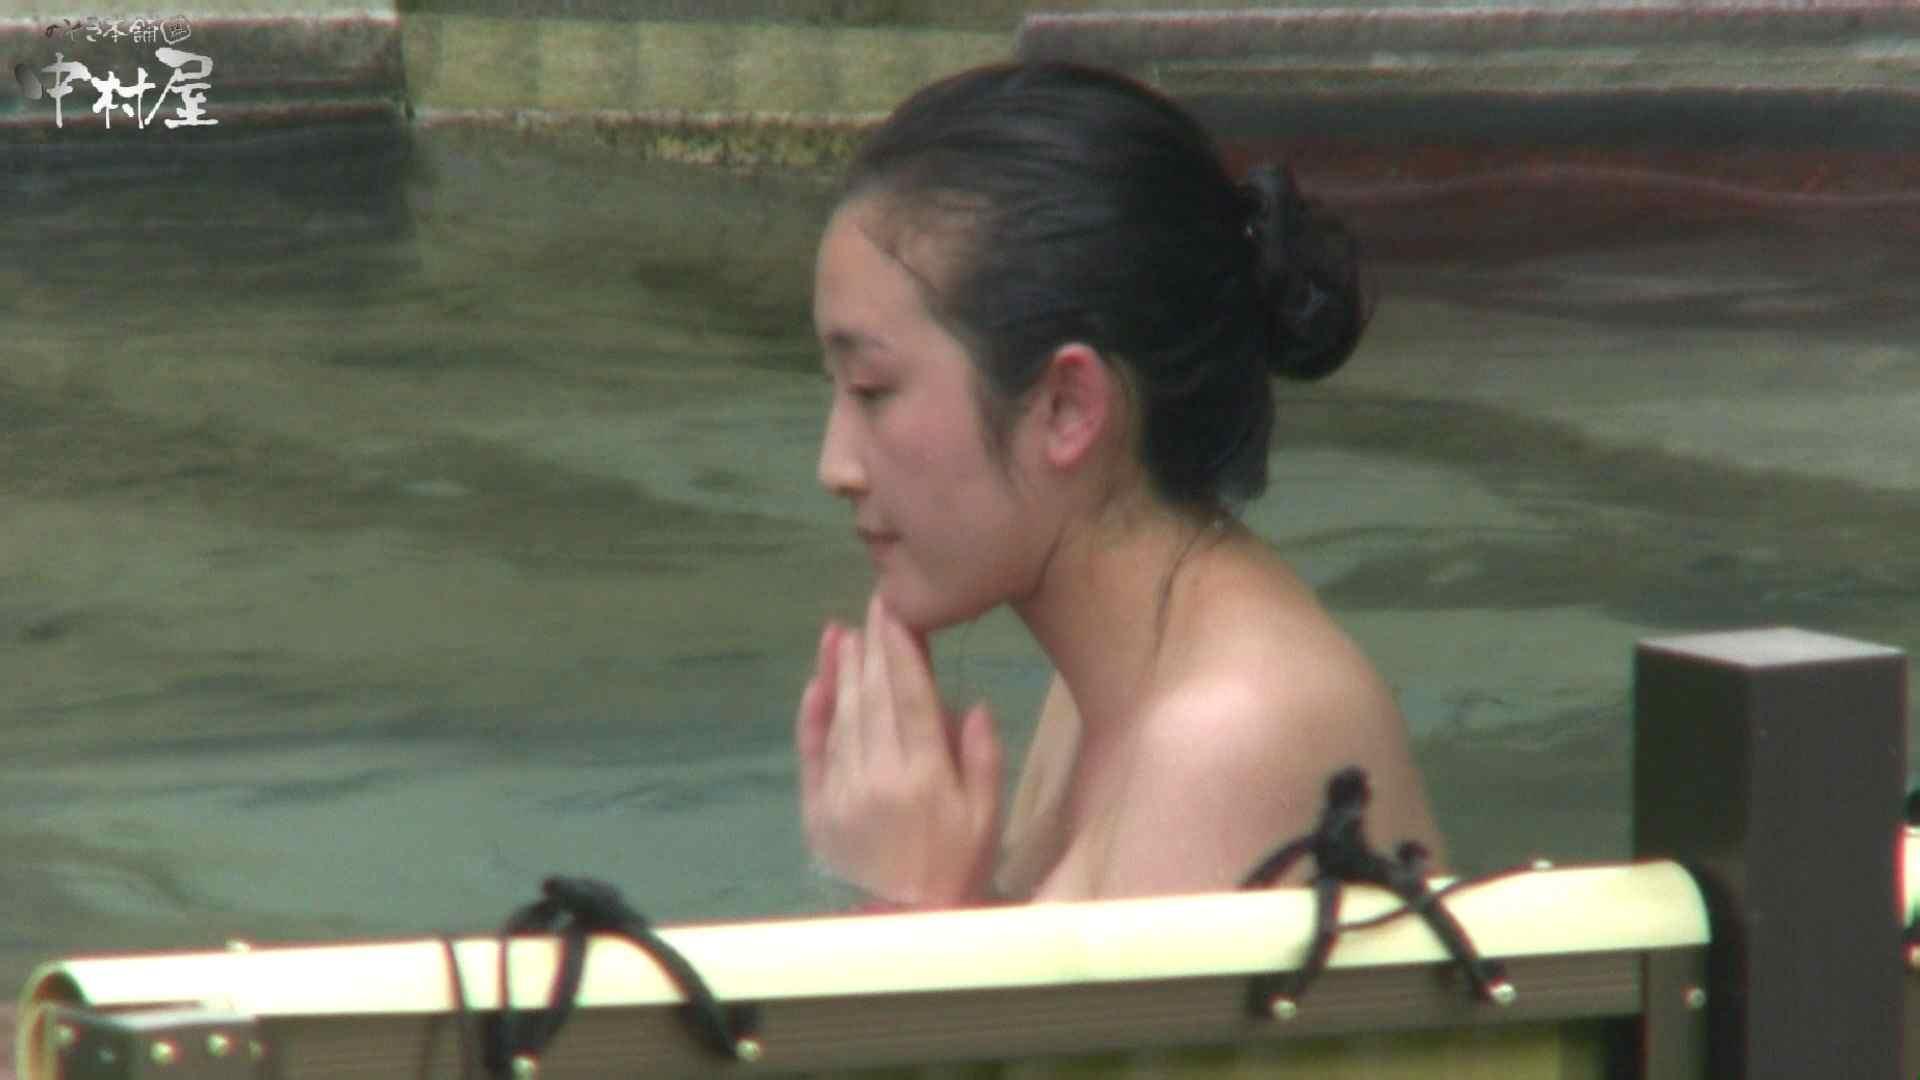 Aquaな露天風呂Vol.949 盗撮 性交動画流出 39連発 23